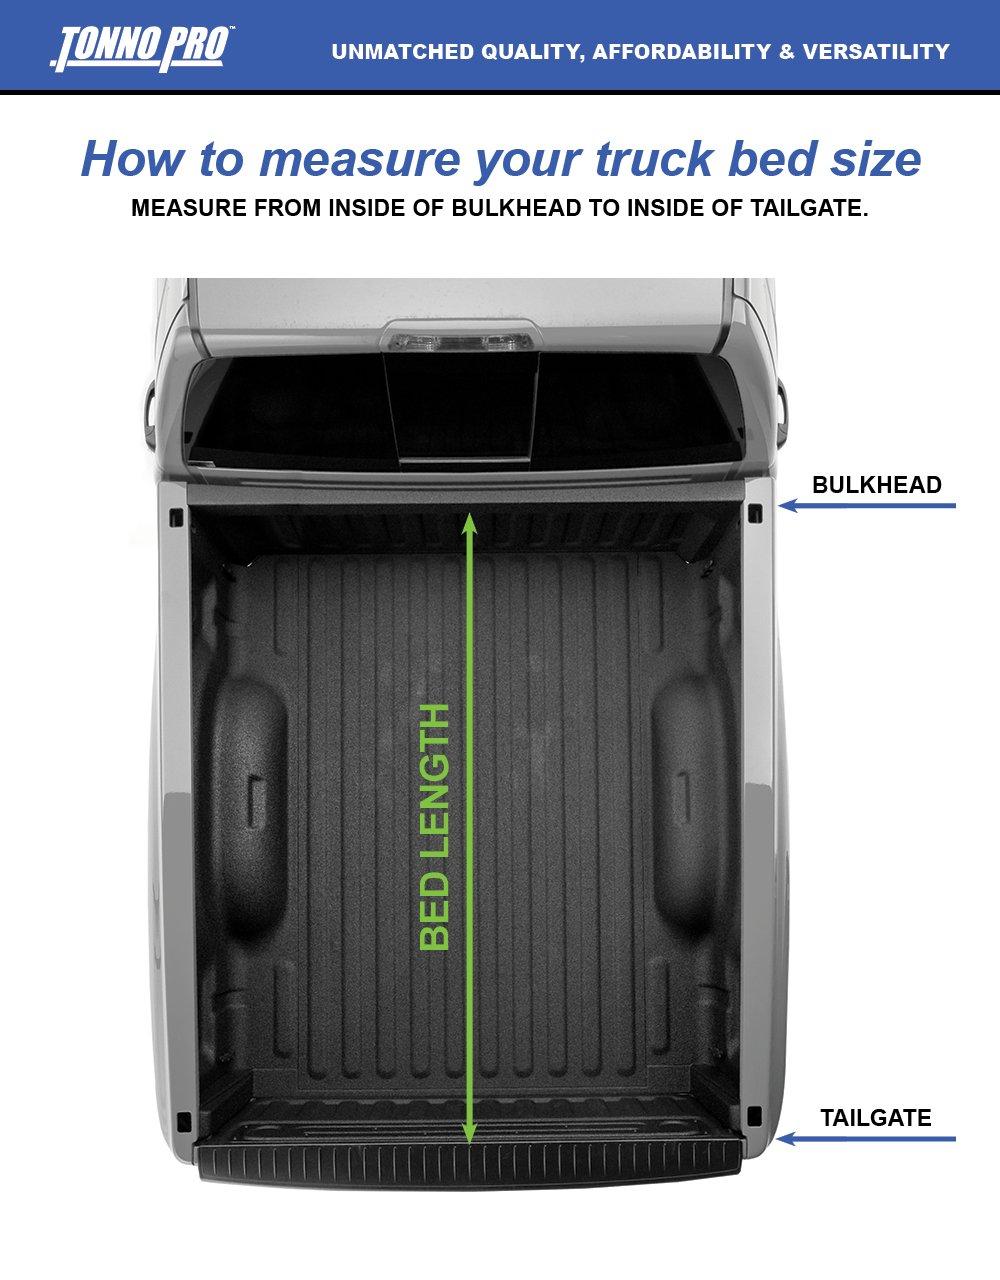 2500 HD 2015-2018 Silverado 2500 // GMC Sierra 2500 Tonno Pro Tonno Fold 42-108 TRI-FOLD Truck Bed Tonneau Cover 2014-2018 Chevrolet Silverado//GMC Sierra 1500 Fits 6.6 Bed